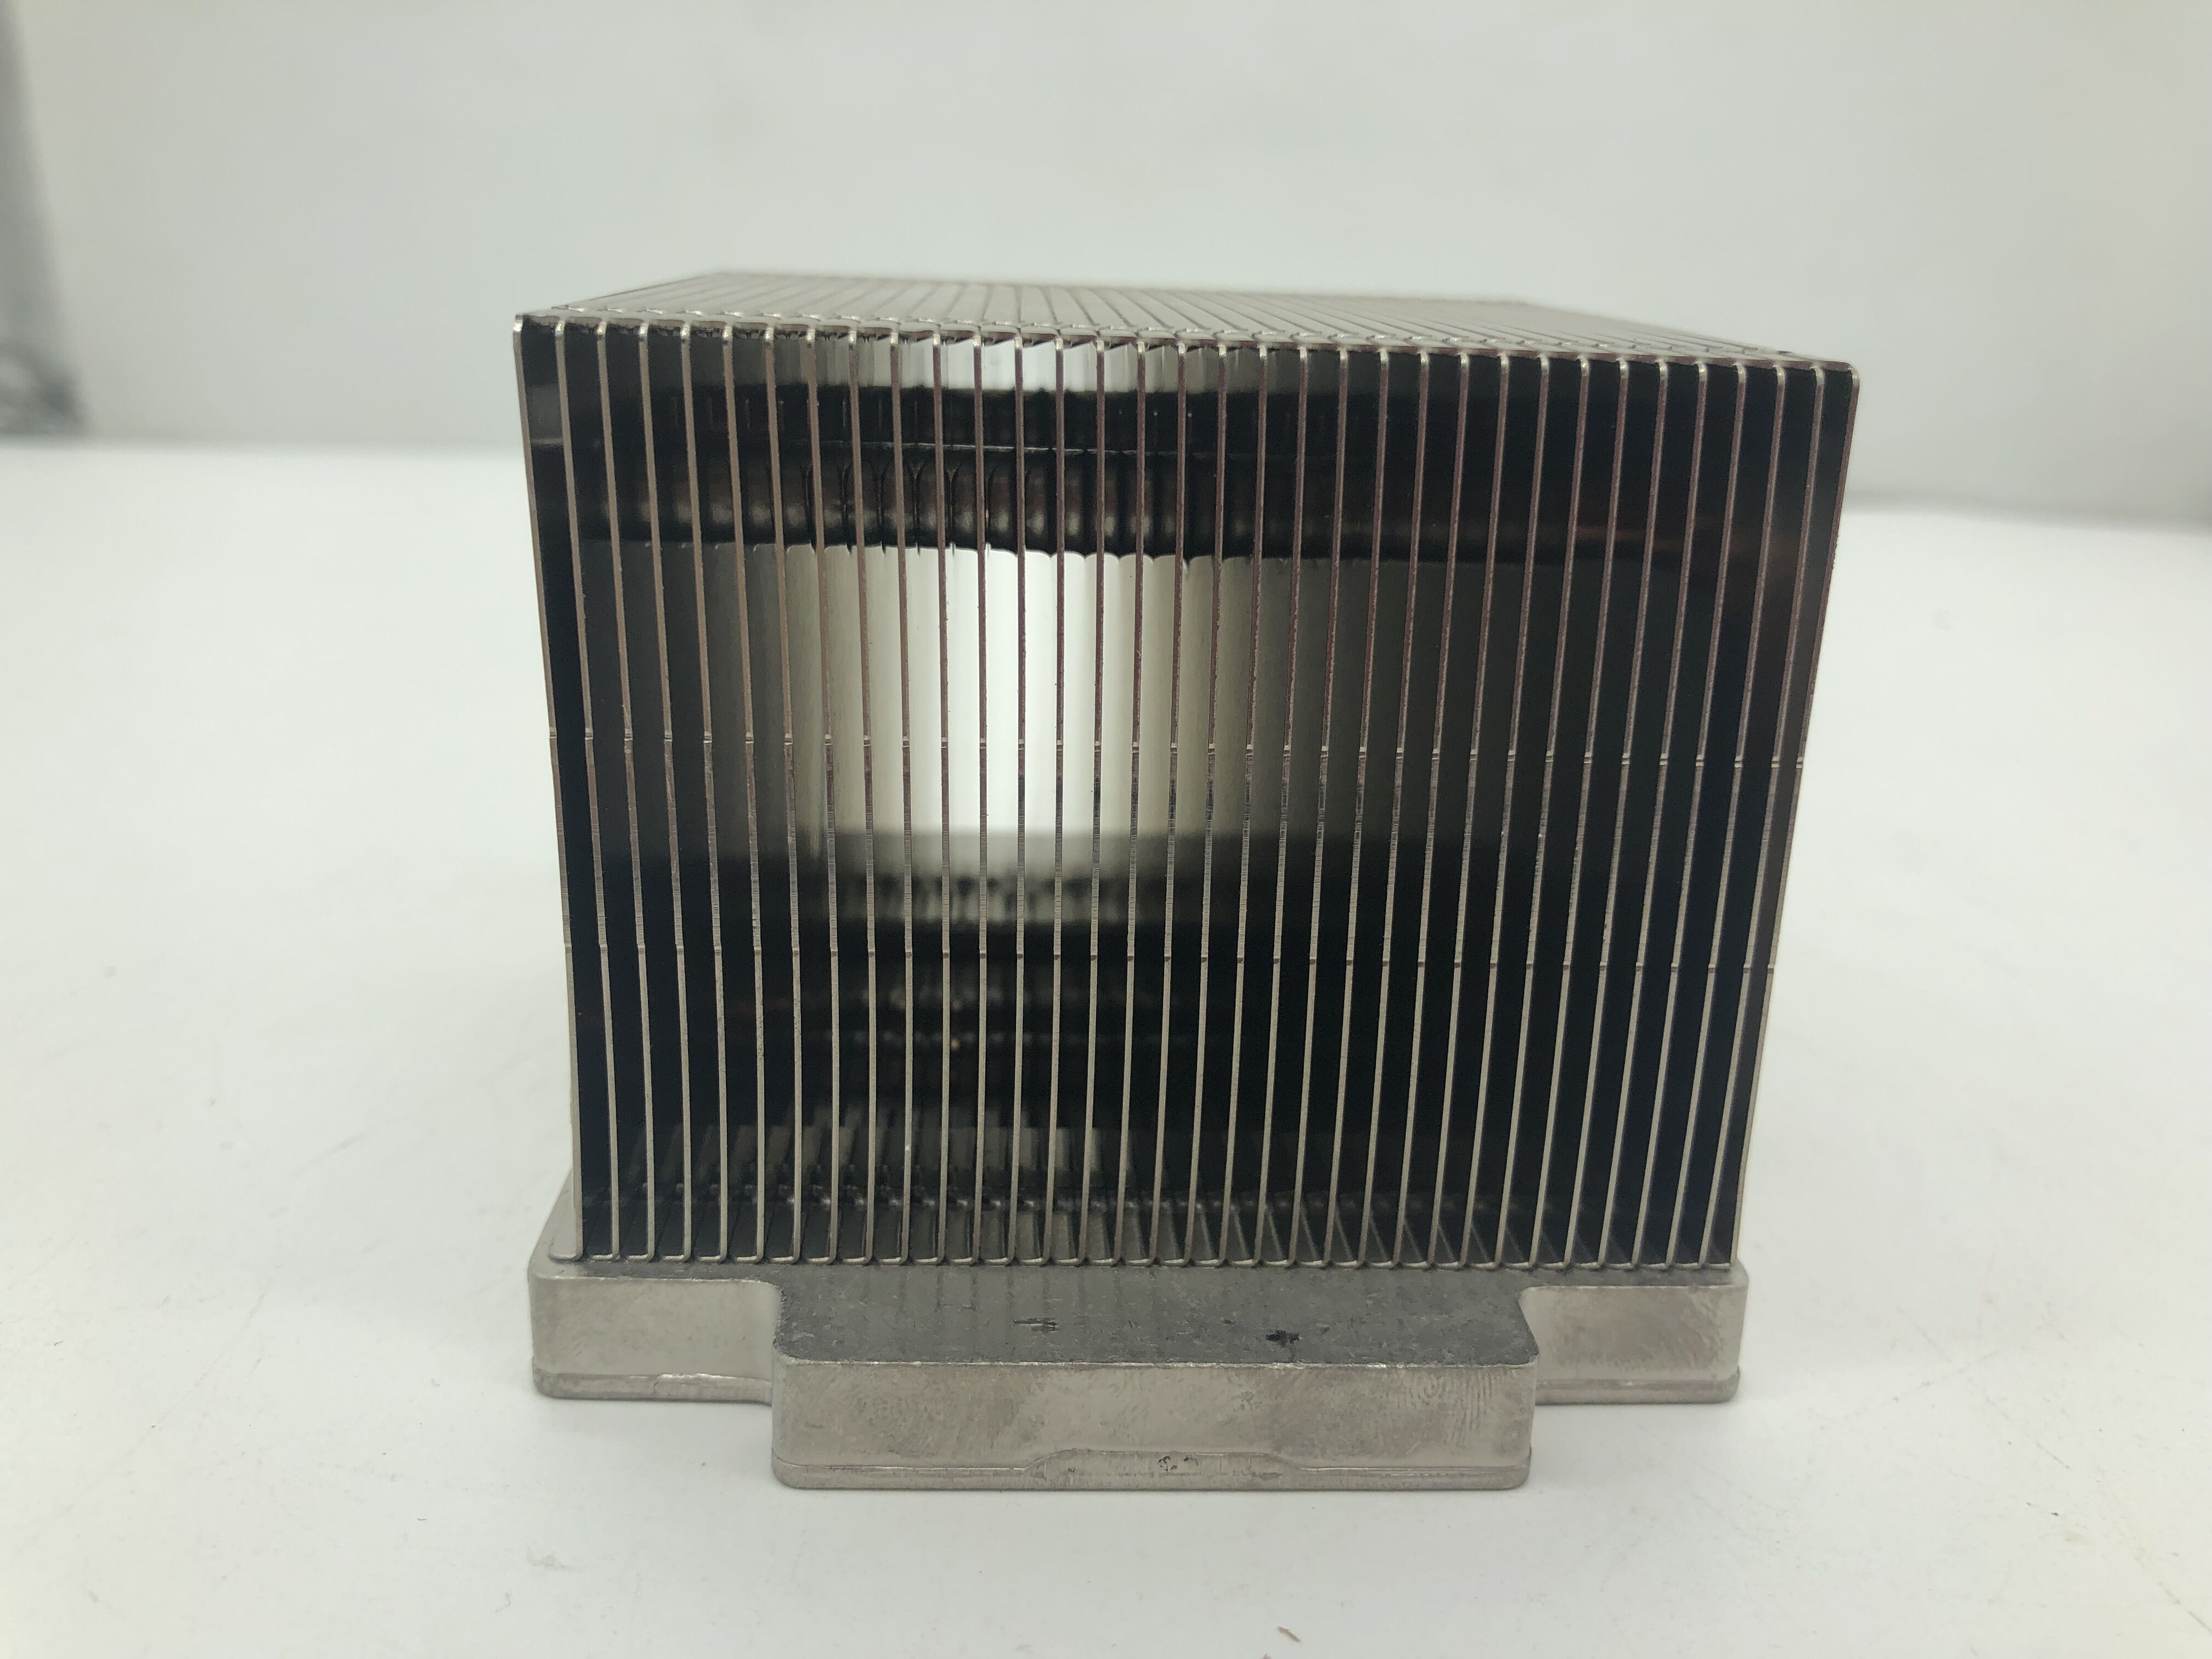 667268-001 661379-001 HEAT SINK For HP ML350p G8 Heatsink Original